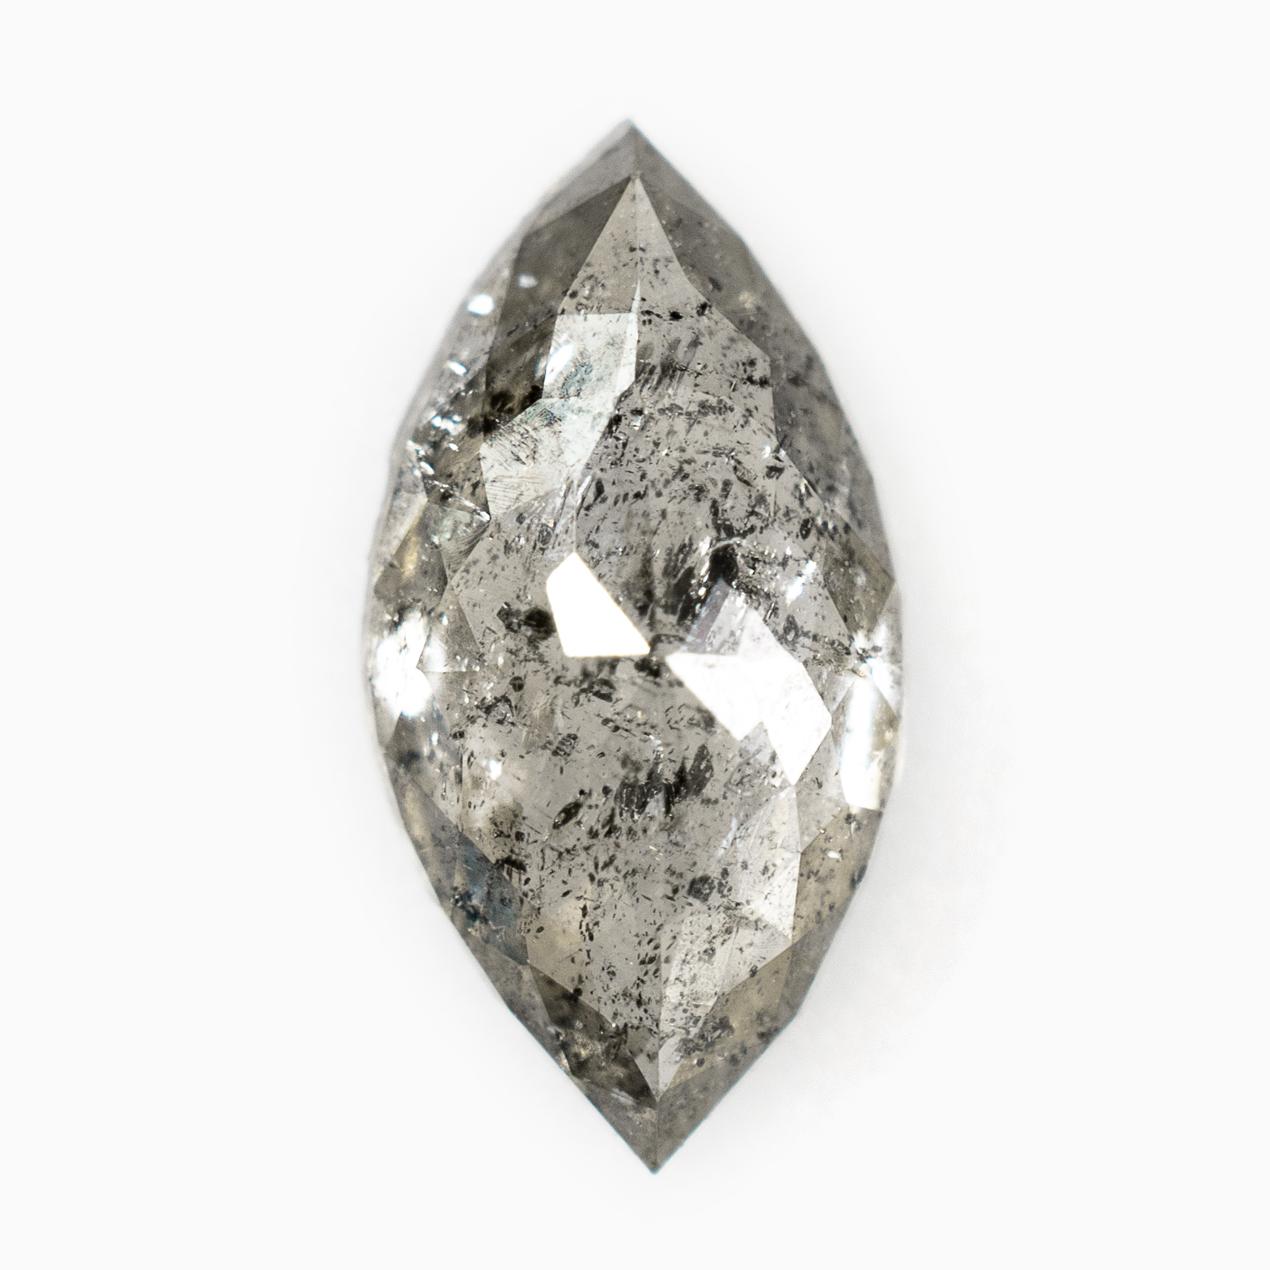 OOAK 0.70Tcw5.70mm DFJ0137 Clear Grey Salt /& Pepper Rose Diamond Rough Diamond Rose Cut Loose Diamonds Raw Diamond Faceted Cabochon